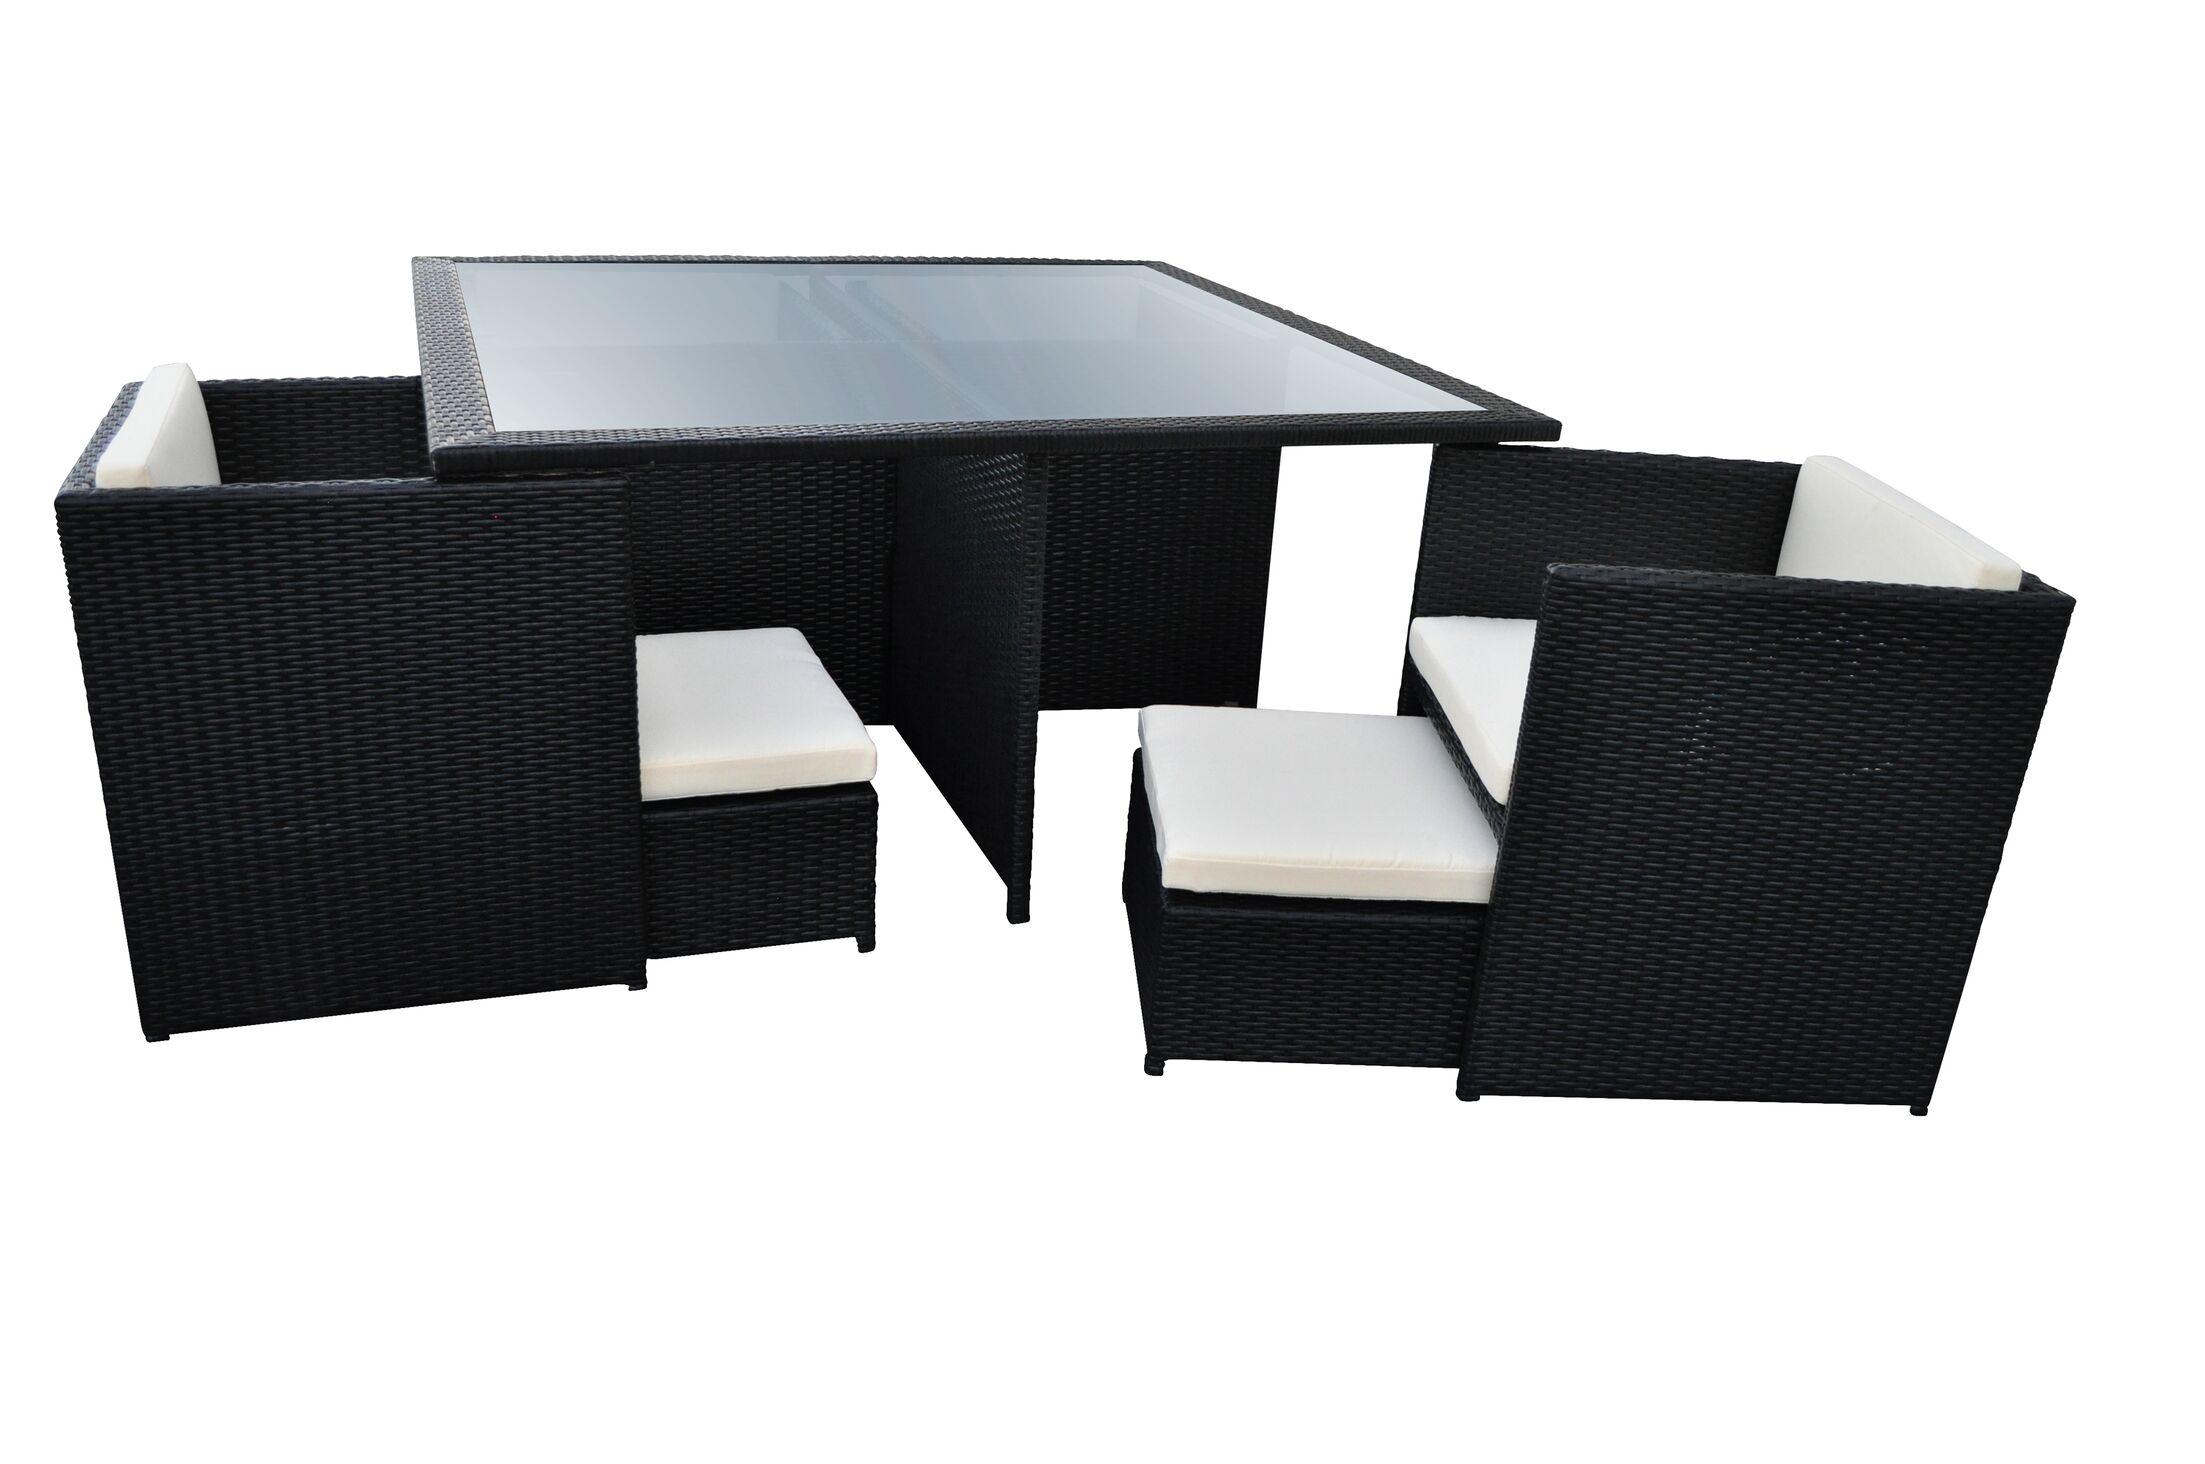 Stella 9 Piece Dining Set with Cushions Finish: Black, Cushion Color: Cream